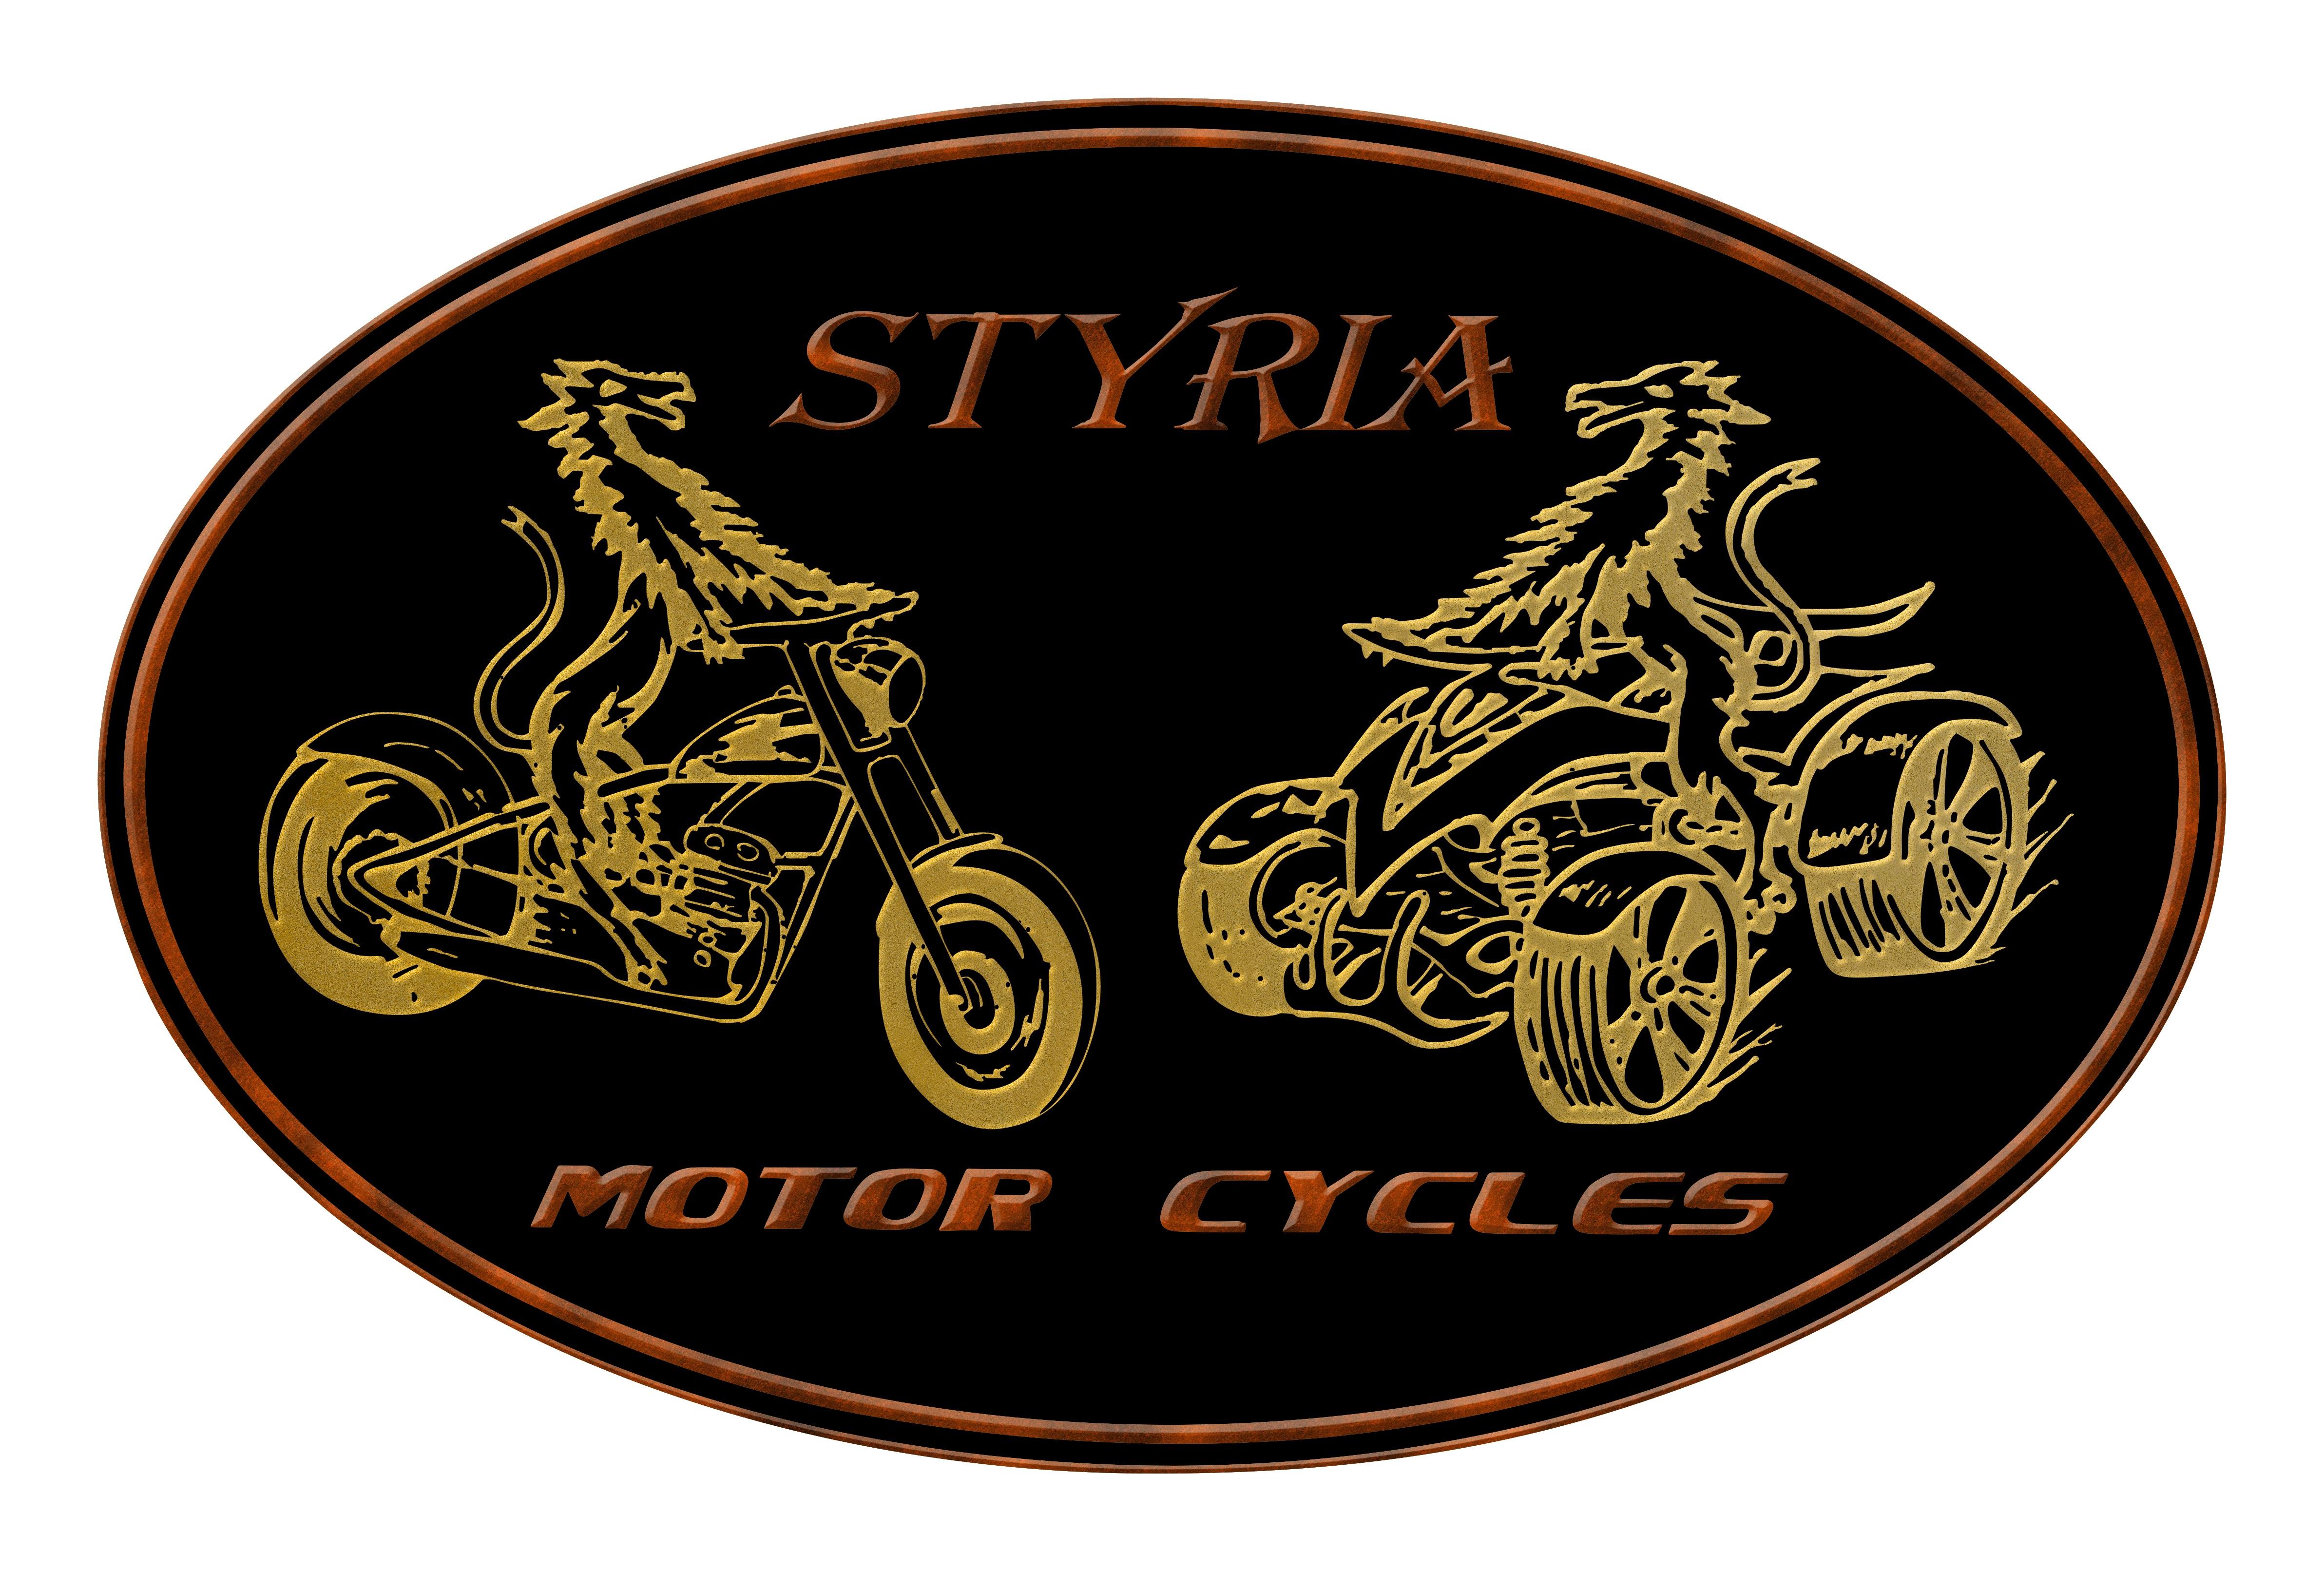 Styria Motor Cycles